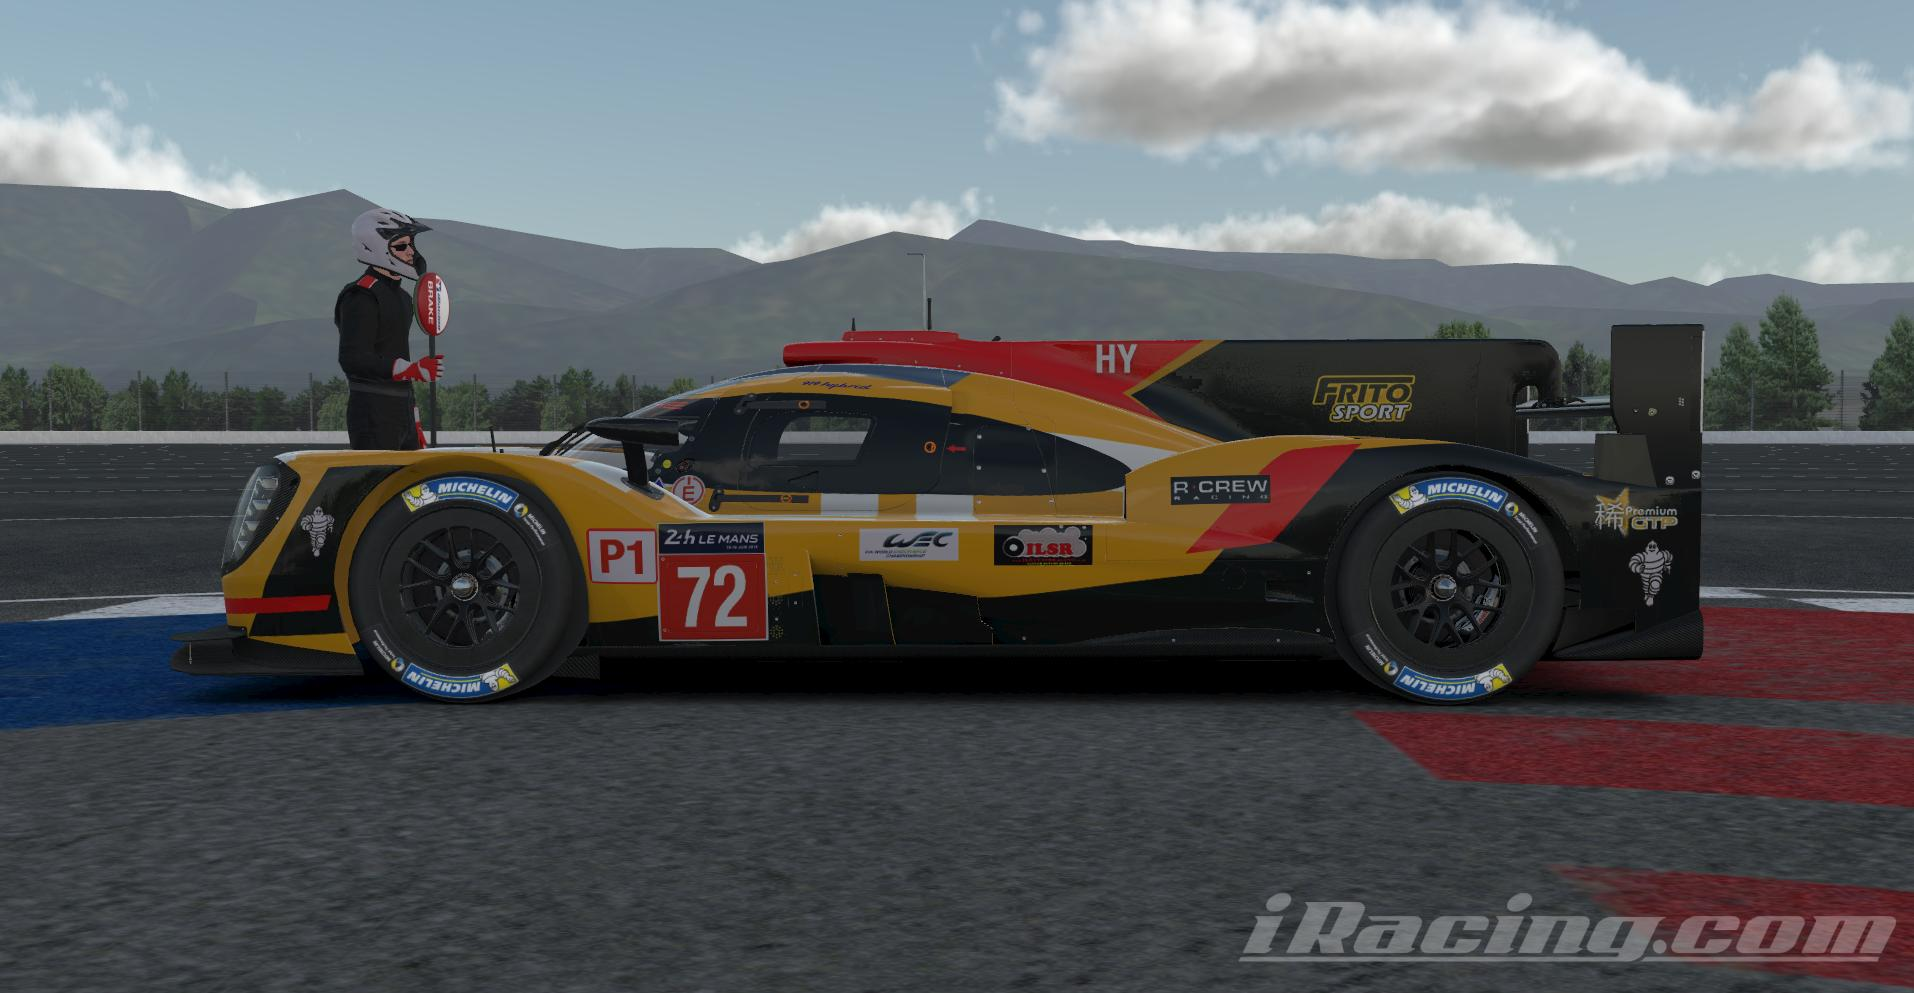 Preview of FritoSport Racing Team Porsche 919 Hybrid by Hugo Hernandez Gutierrez